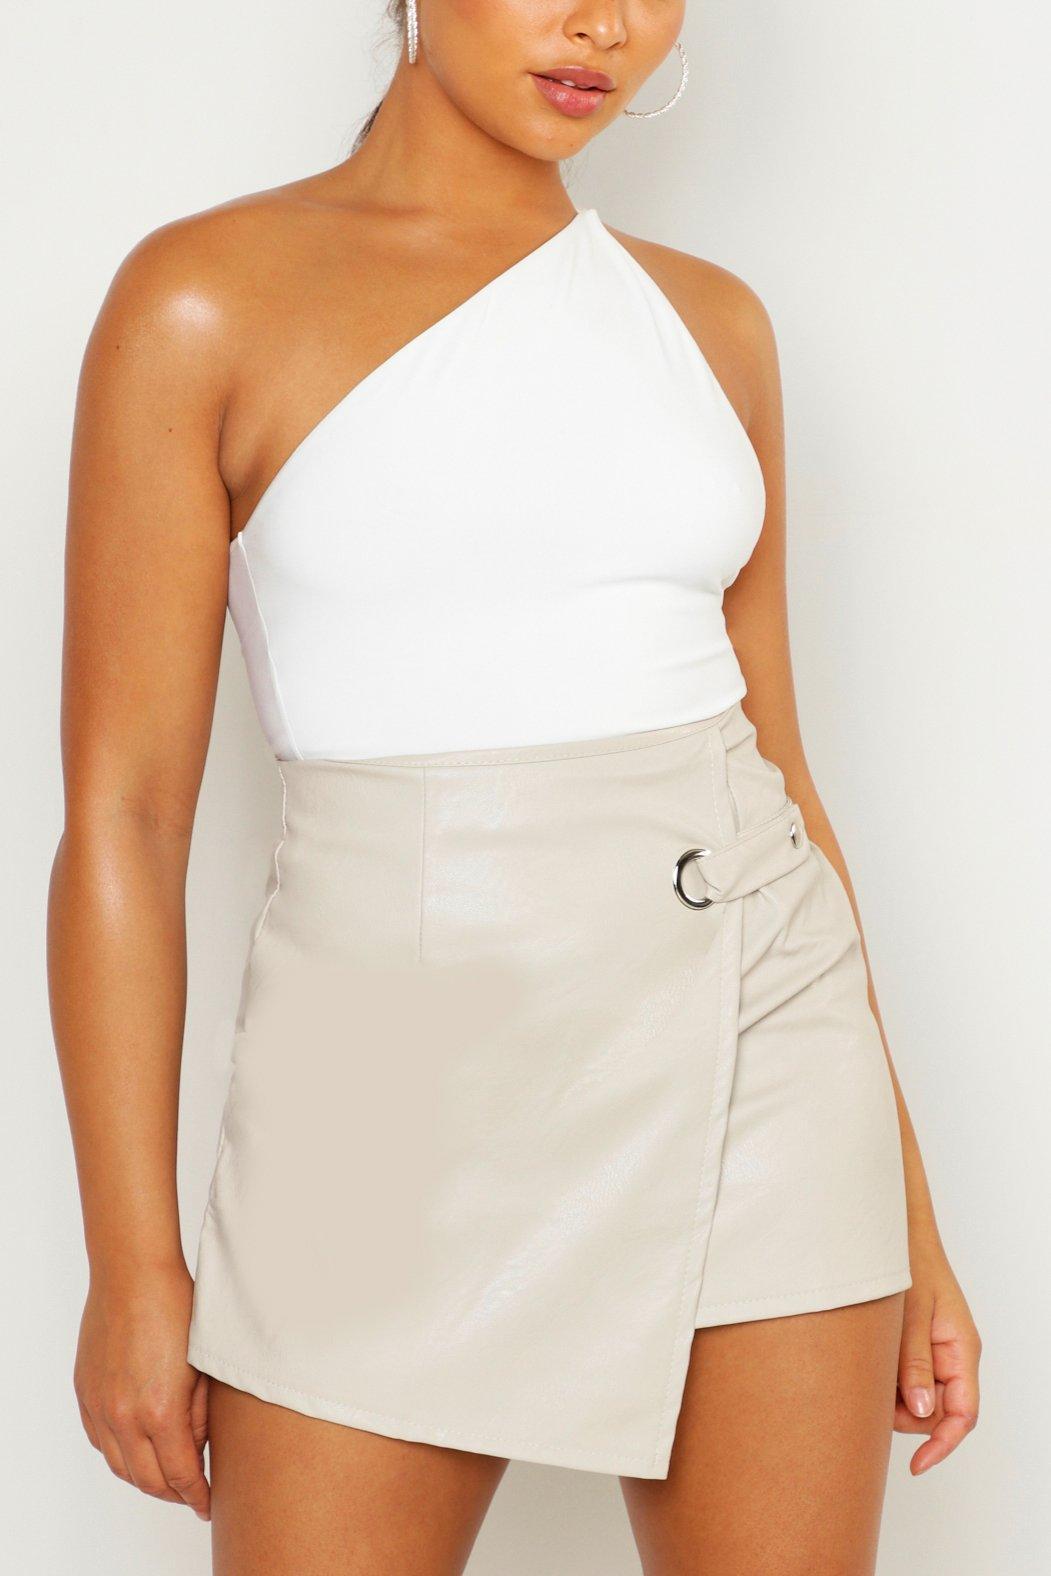 Boohoo   Мини-юбка из искусственной кожи с запахом спереди   Clouty